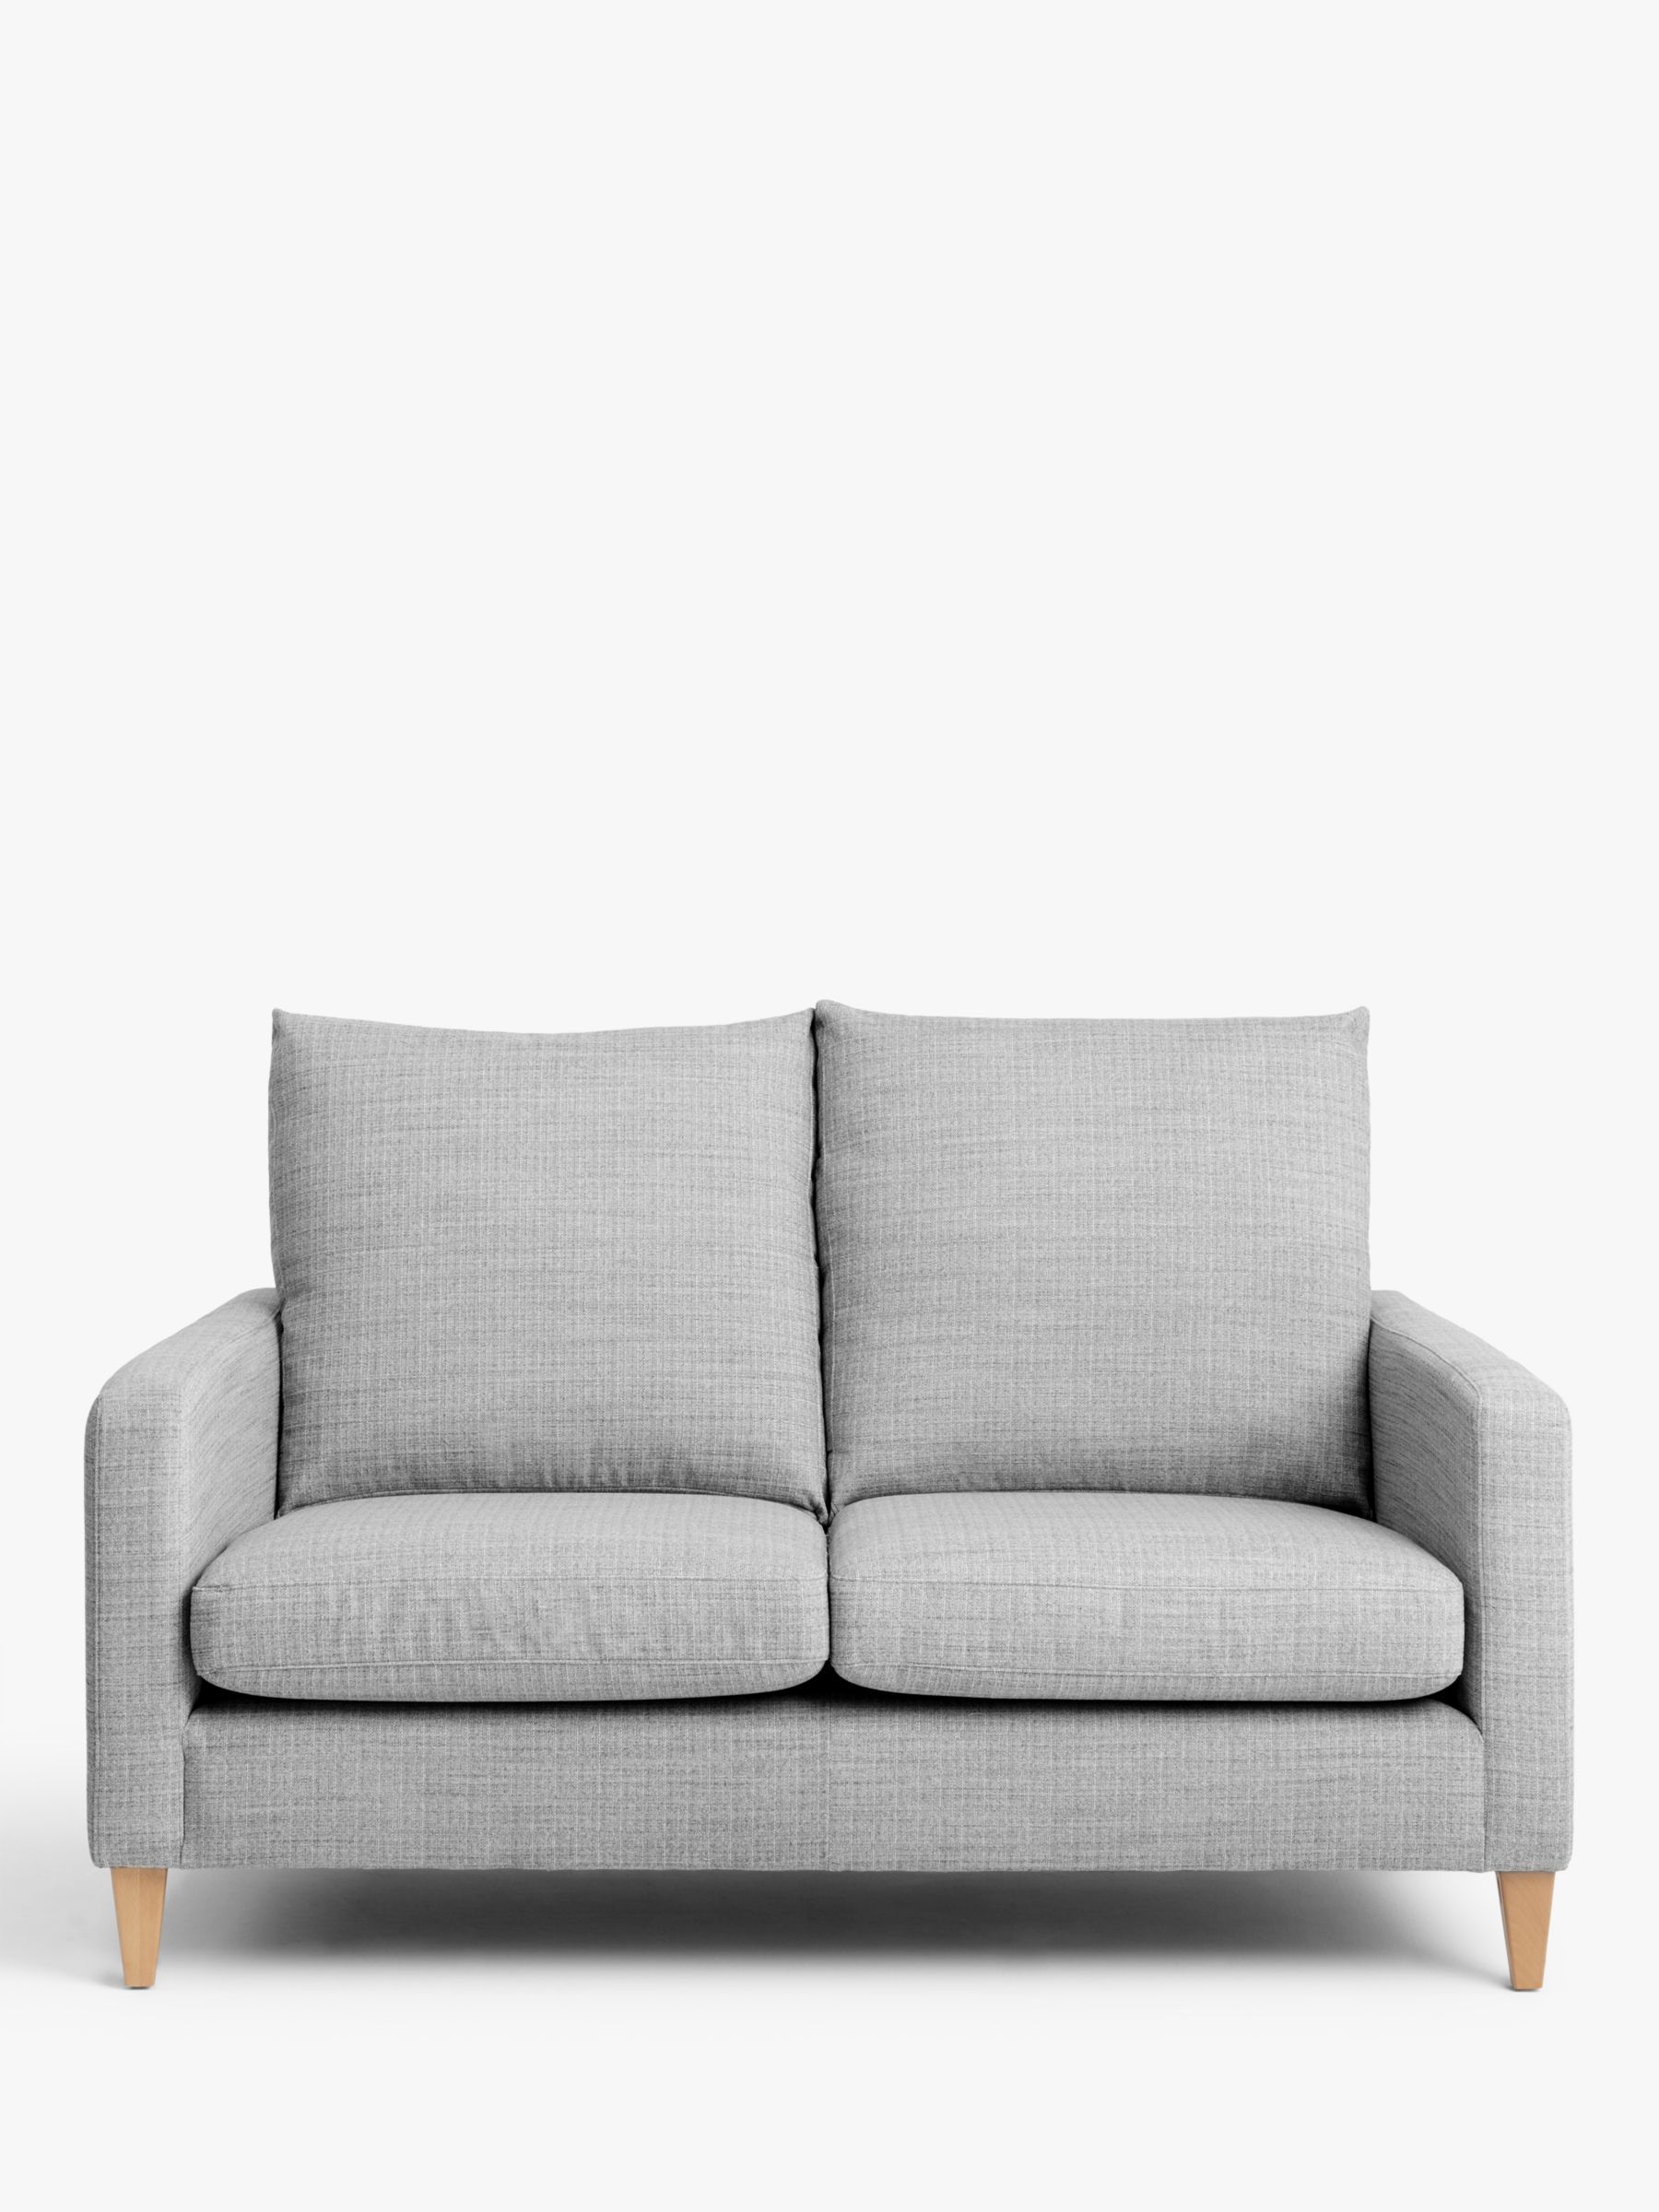 John Lewis Partners Bailey High Back Small 2 Seater Sofa 2 Seater Sofa Sofa Furniture